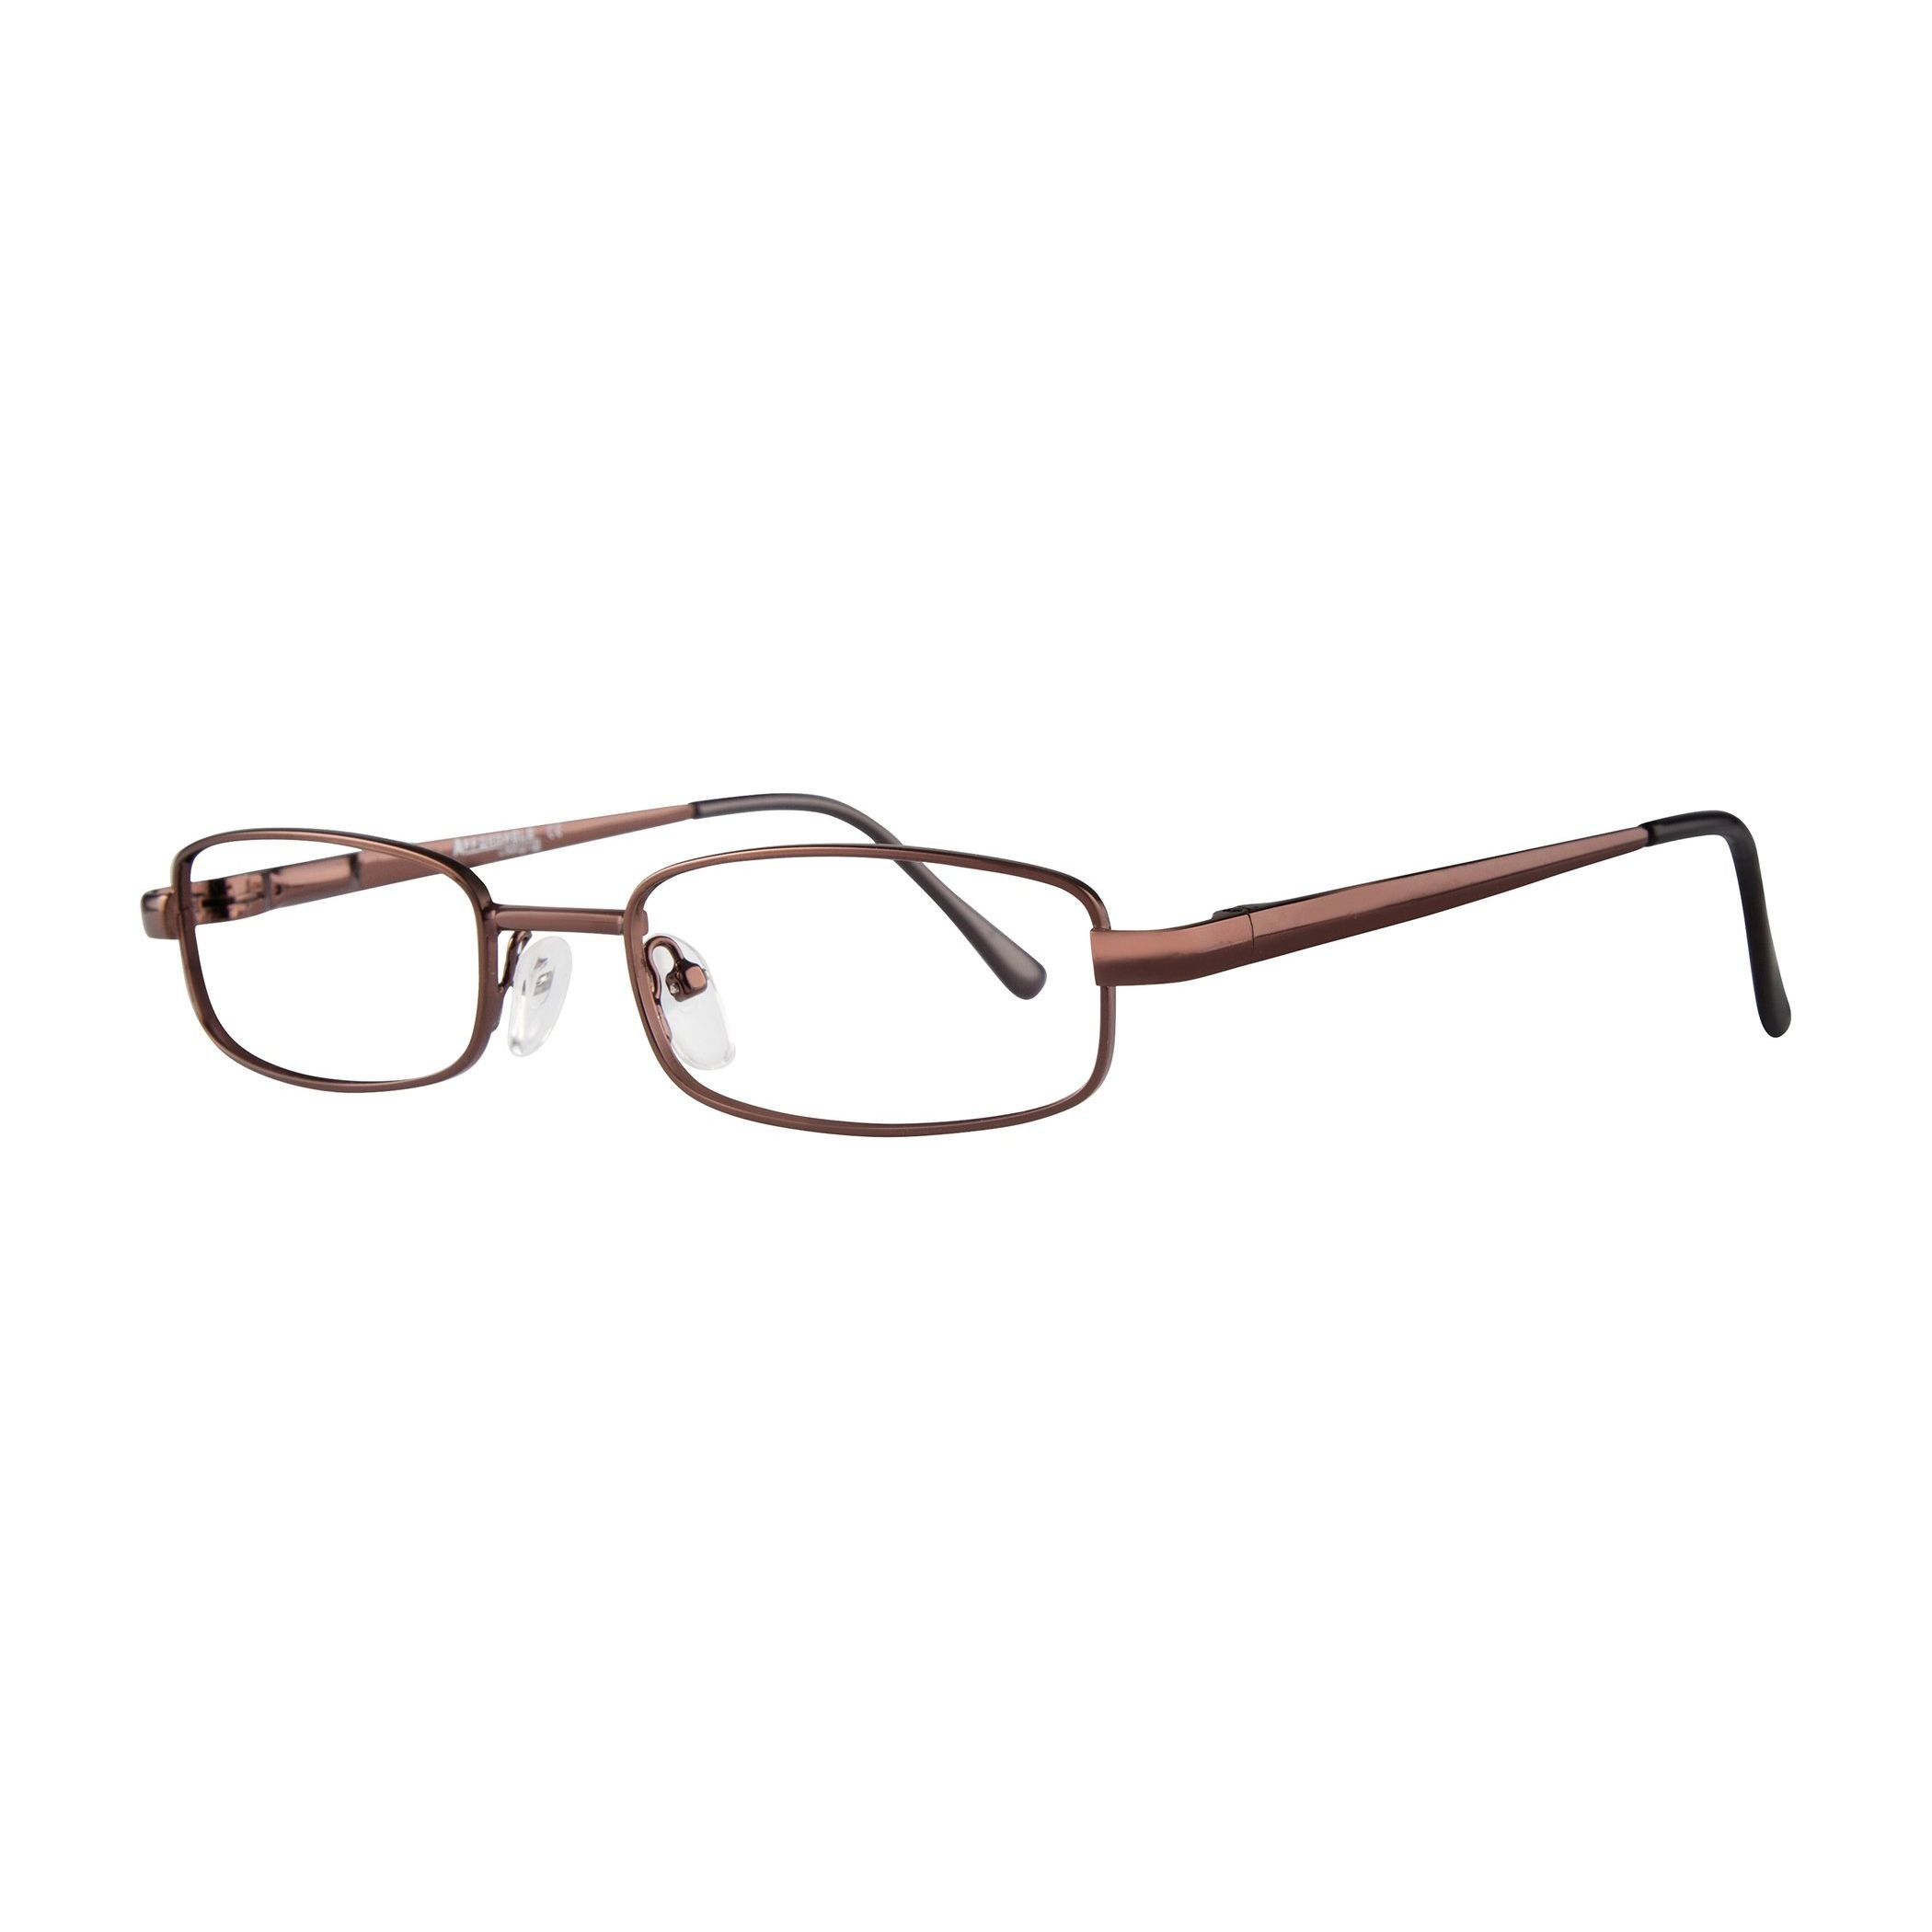 a2a7d8b1b814 Affordable Designs Bruce Eyeglasses